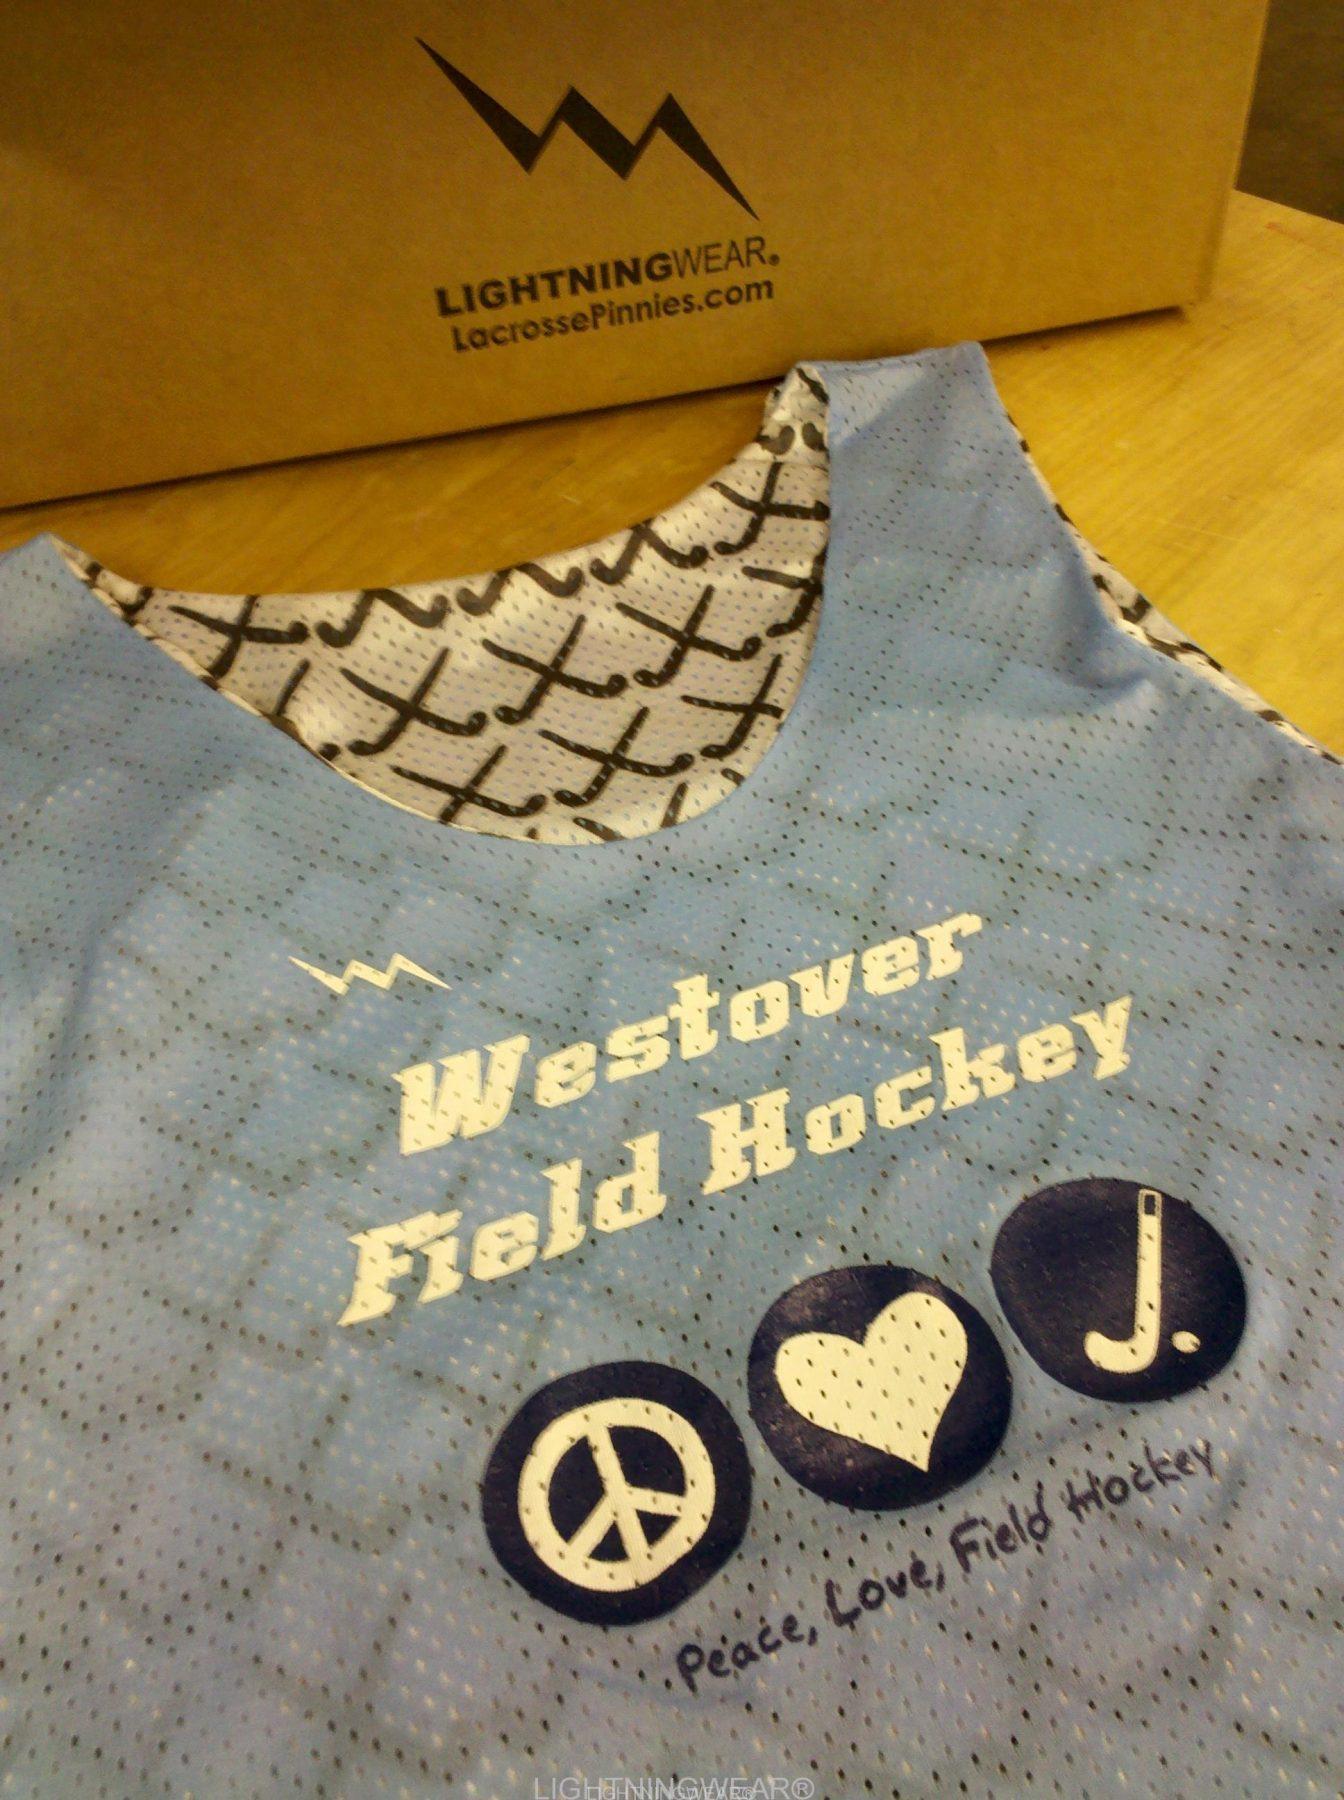 westover field hockey